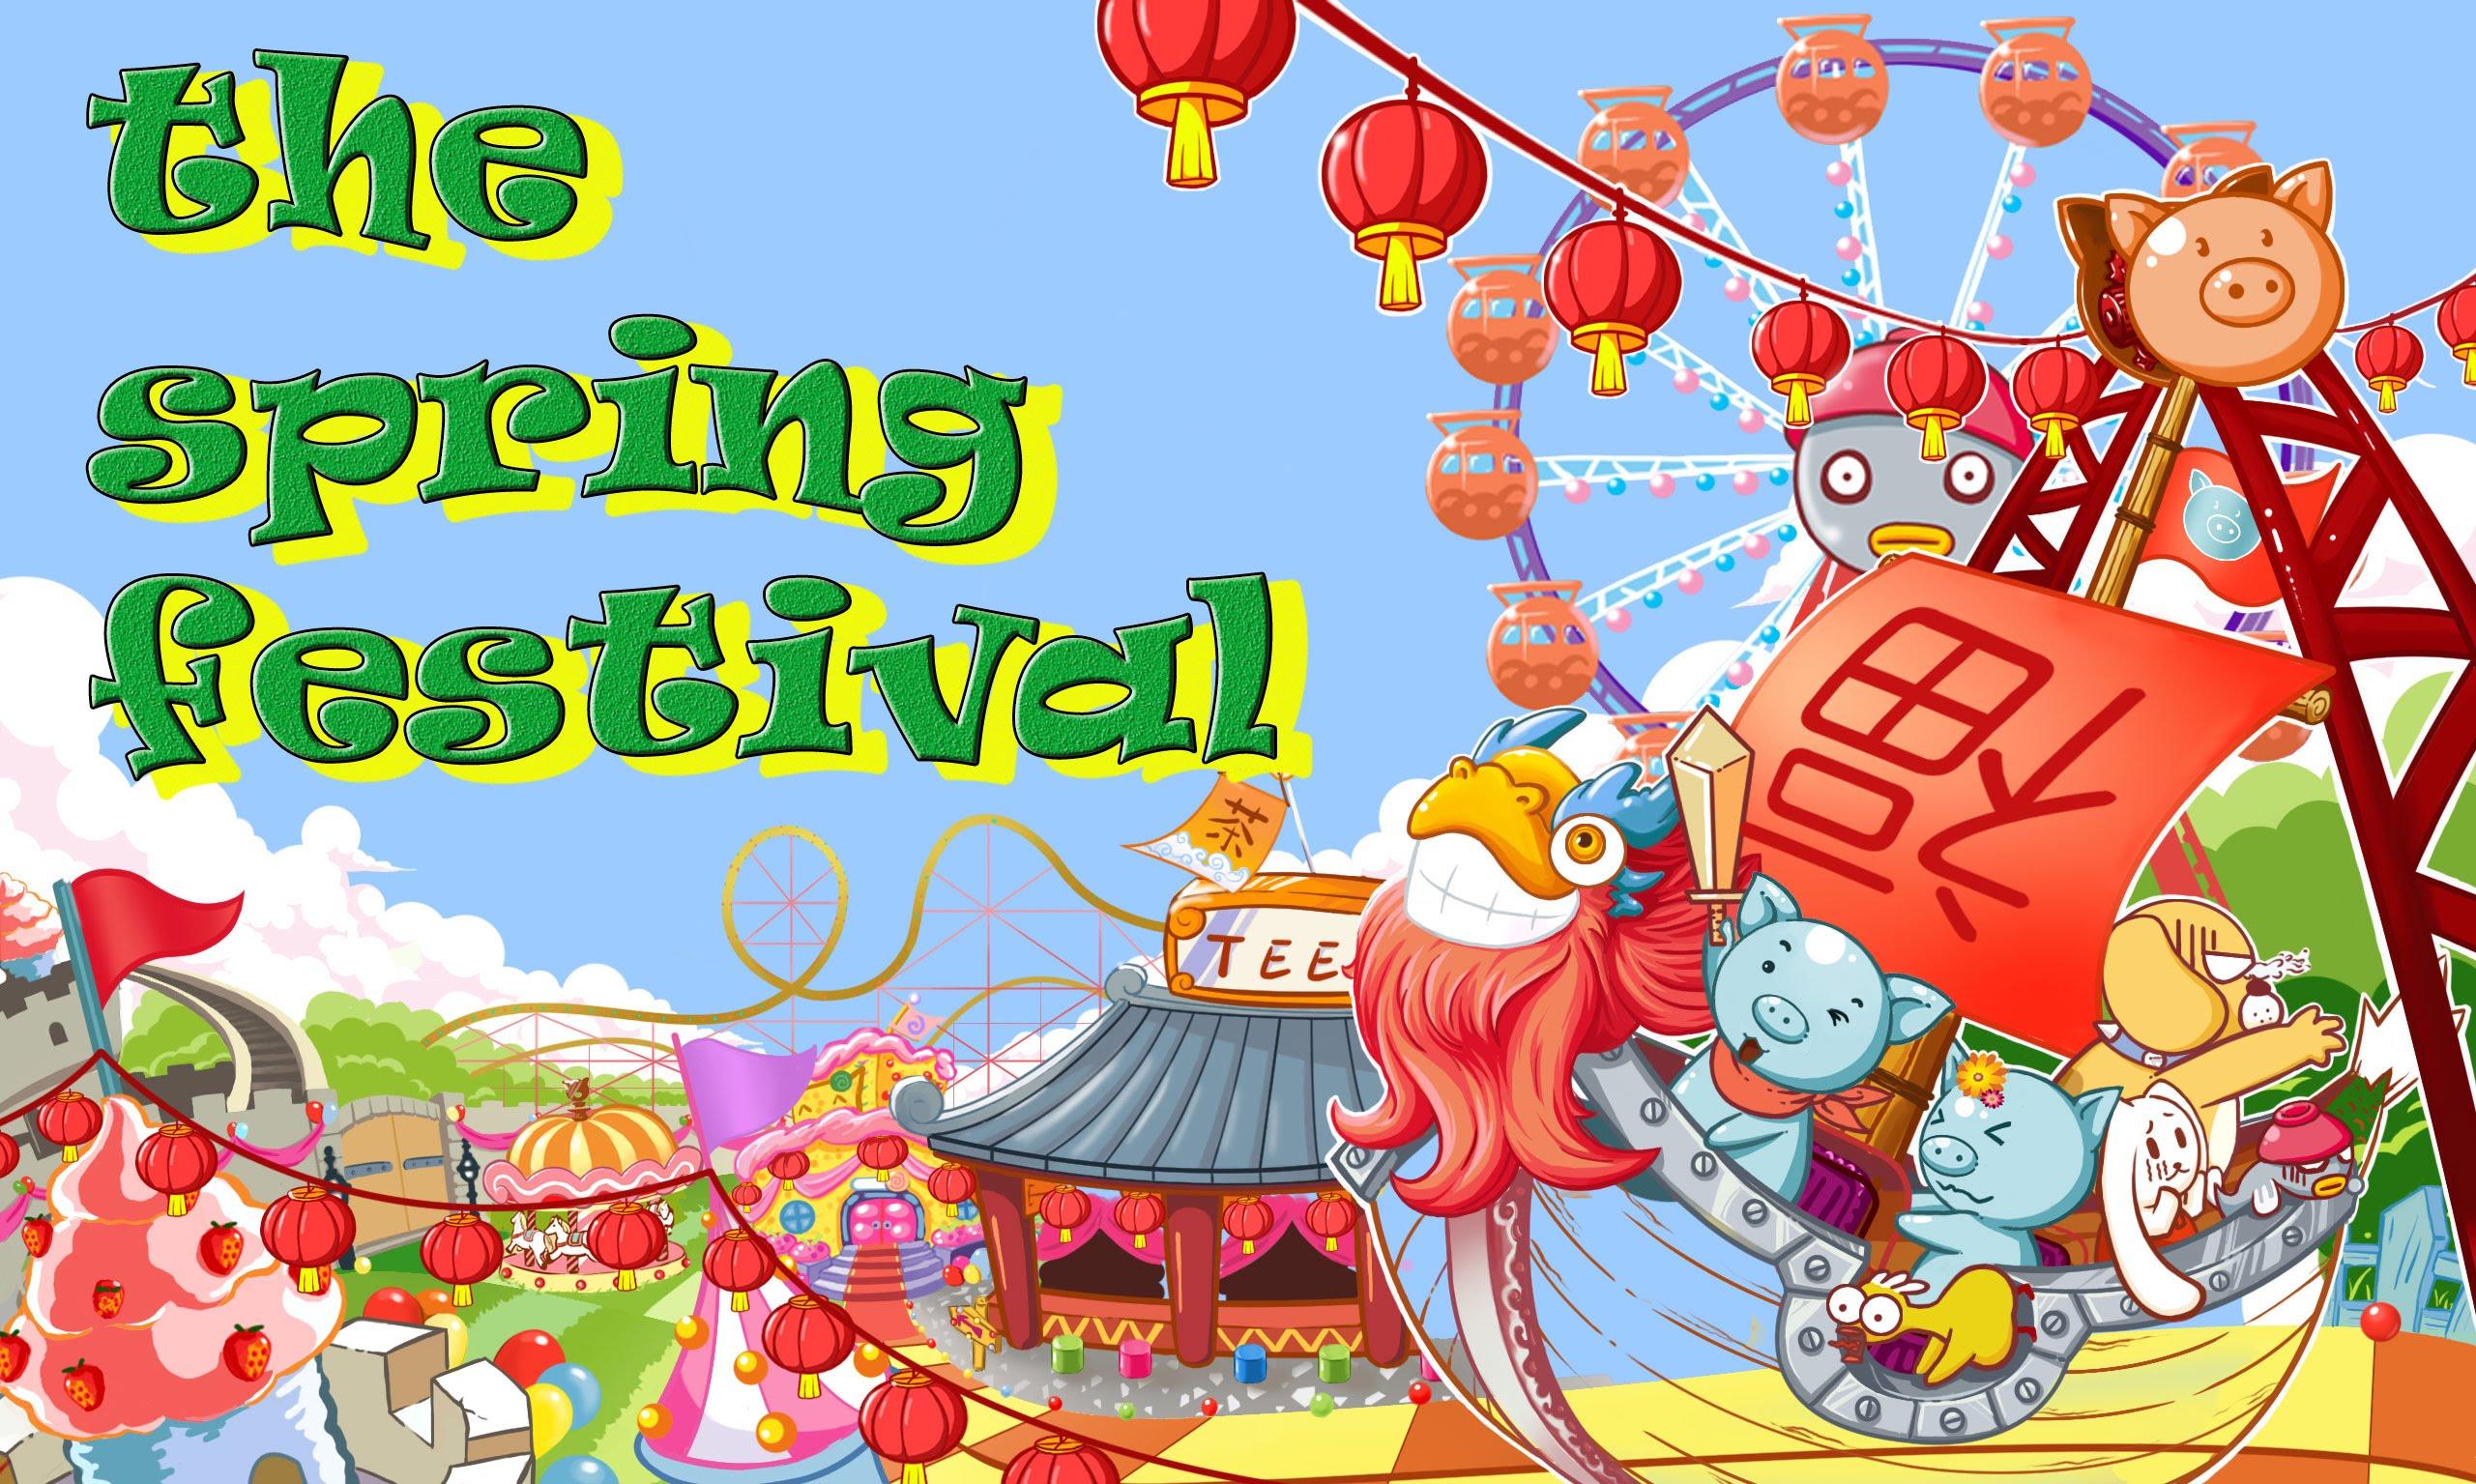 Celebration clipart festival. Oral mandarin chinese lesson